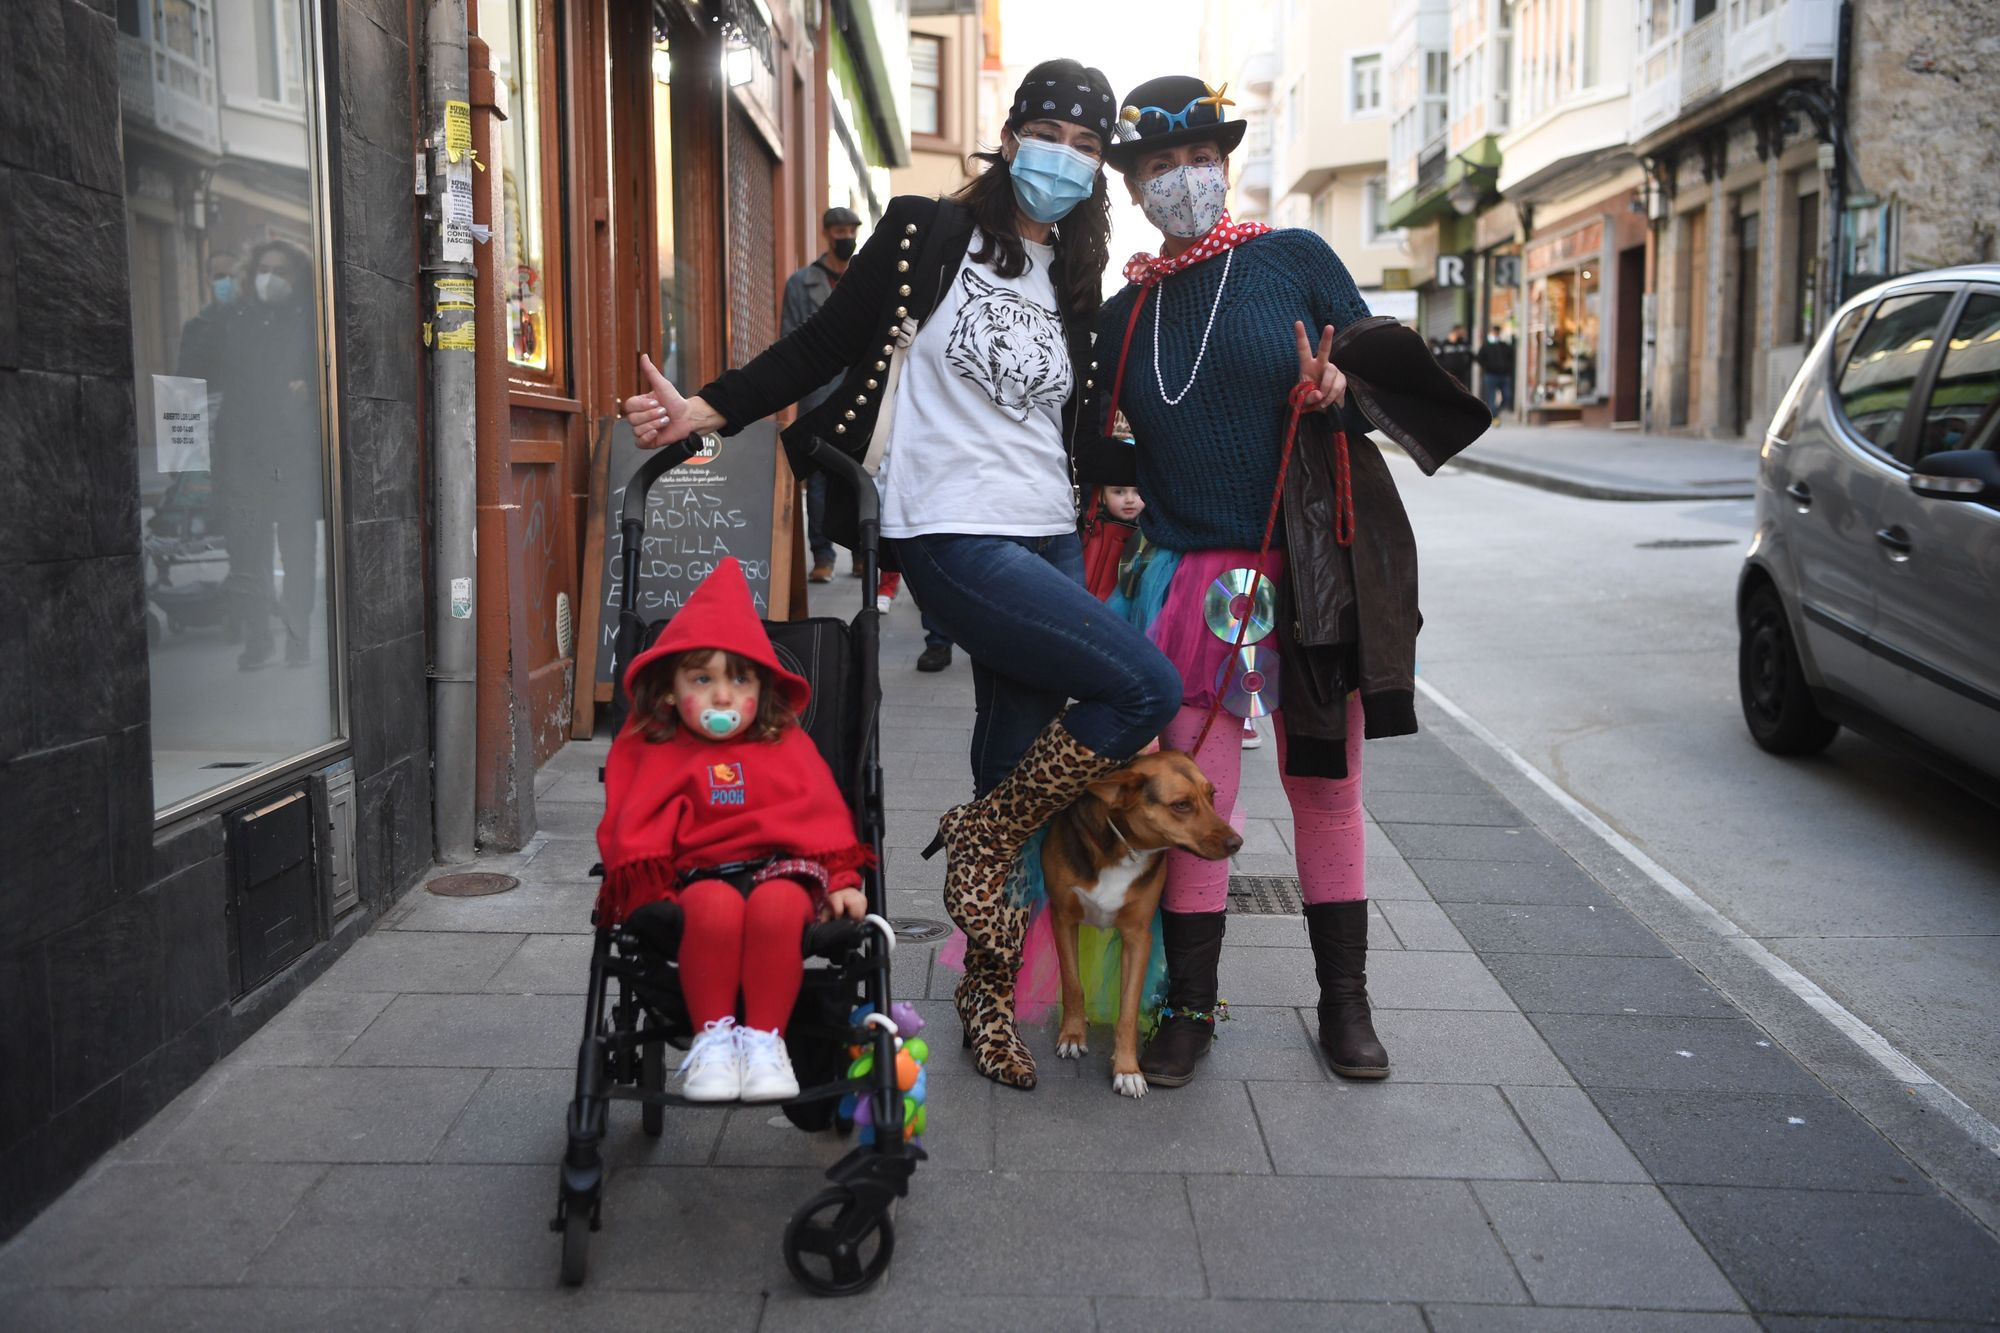 El Entroido de 2021, el menos 'choqueiro' en A Coruña